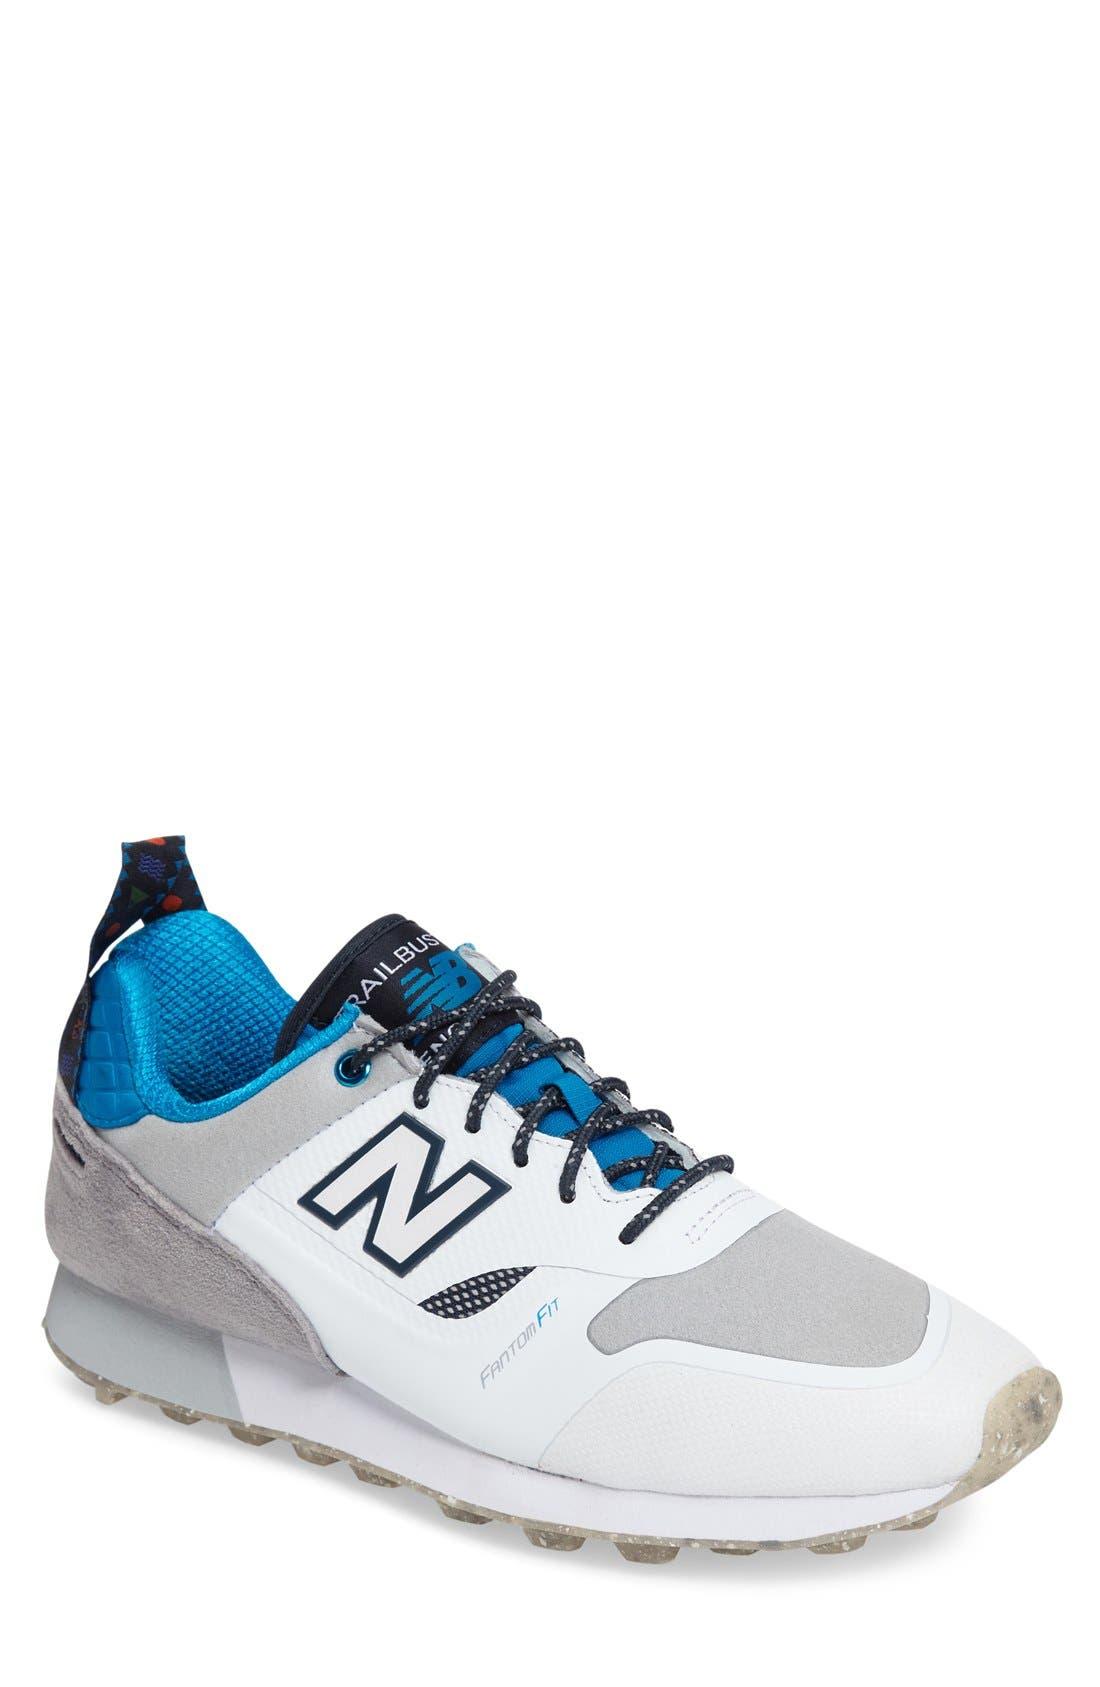 Alternate Image 1 Selected - New Balance Must Land Sneaker (Men)